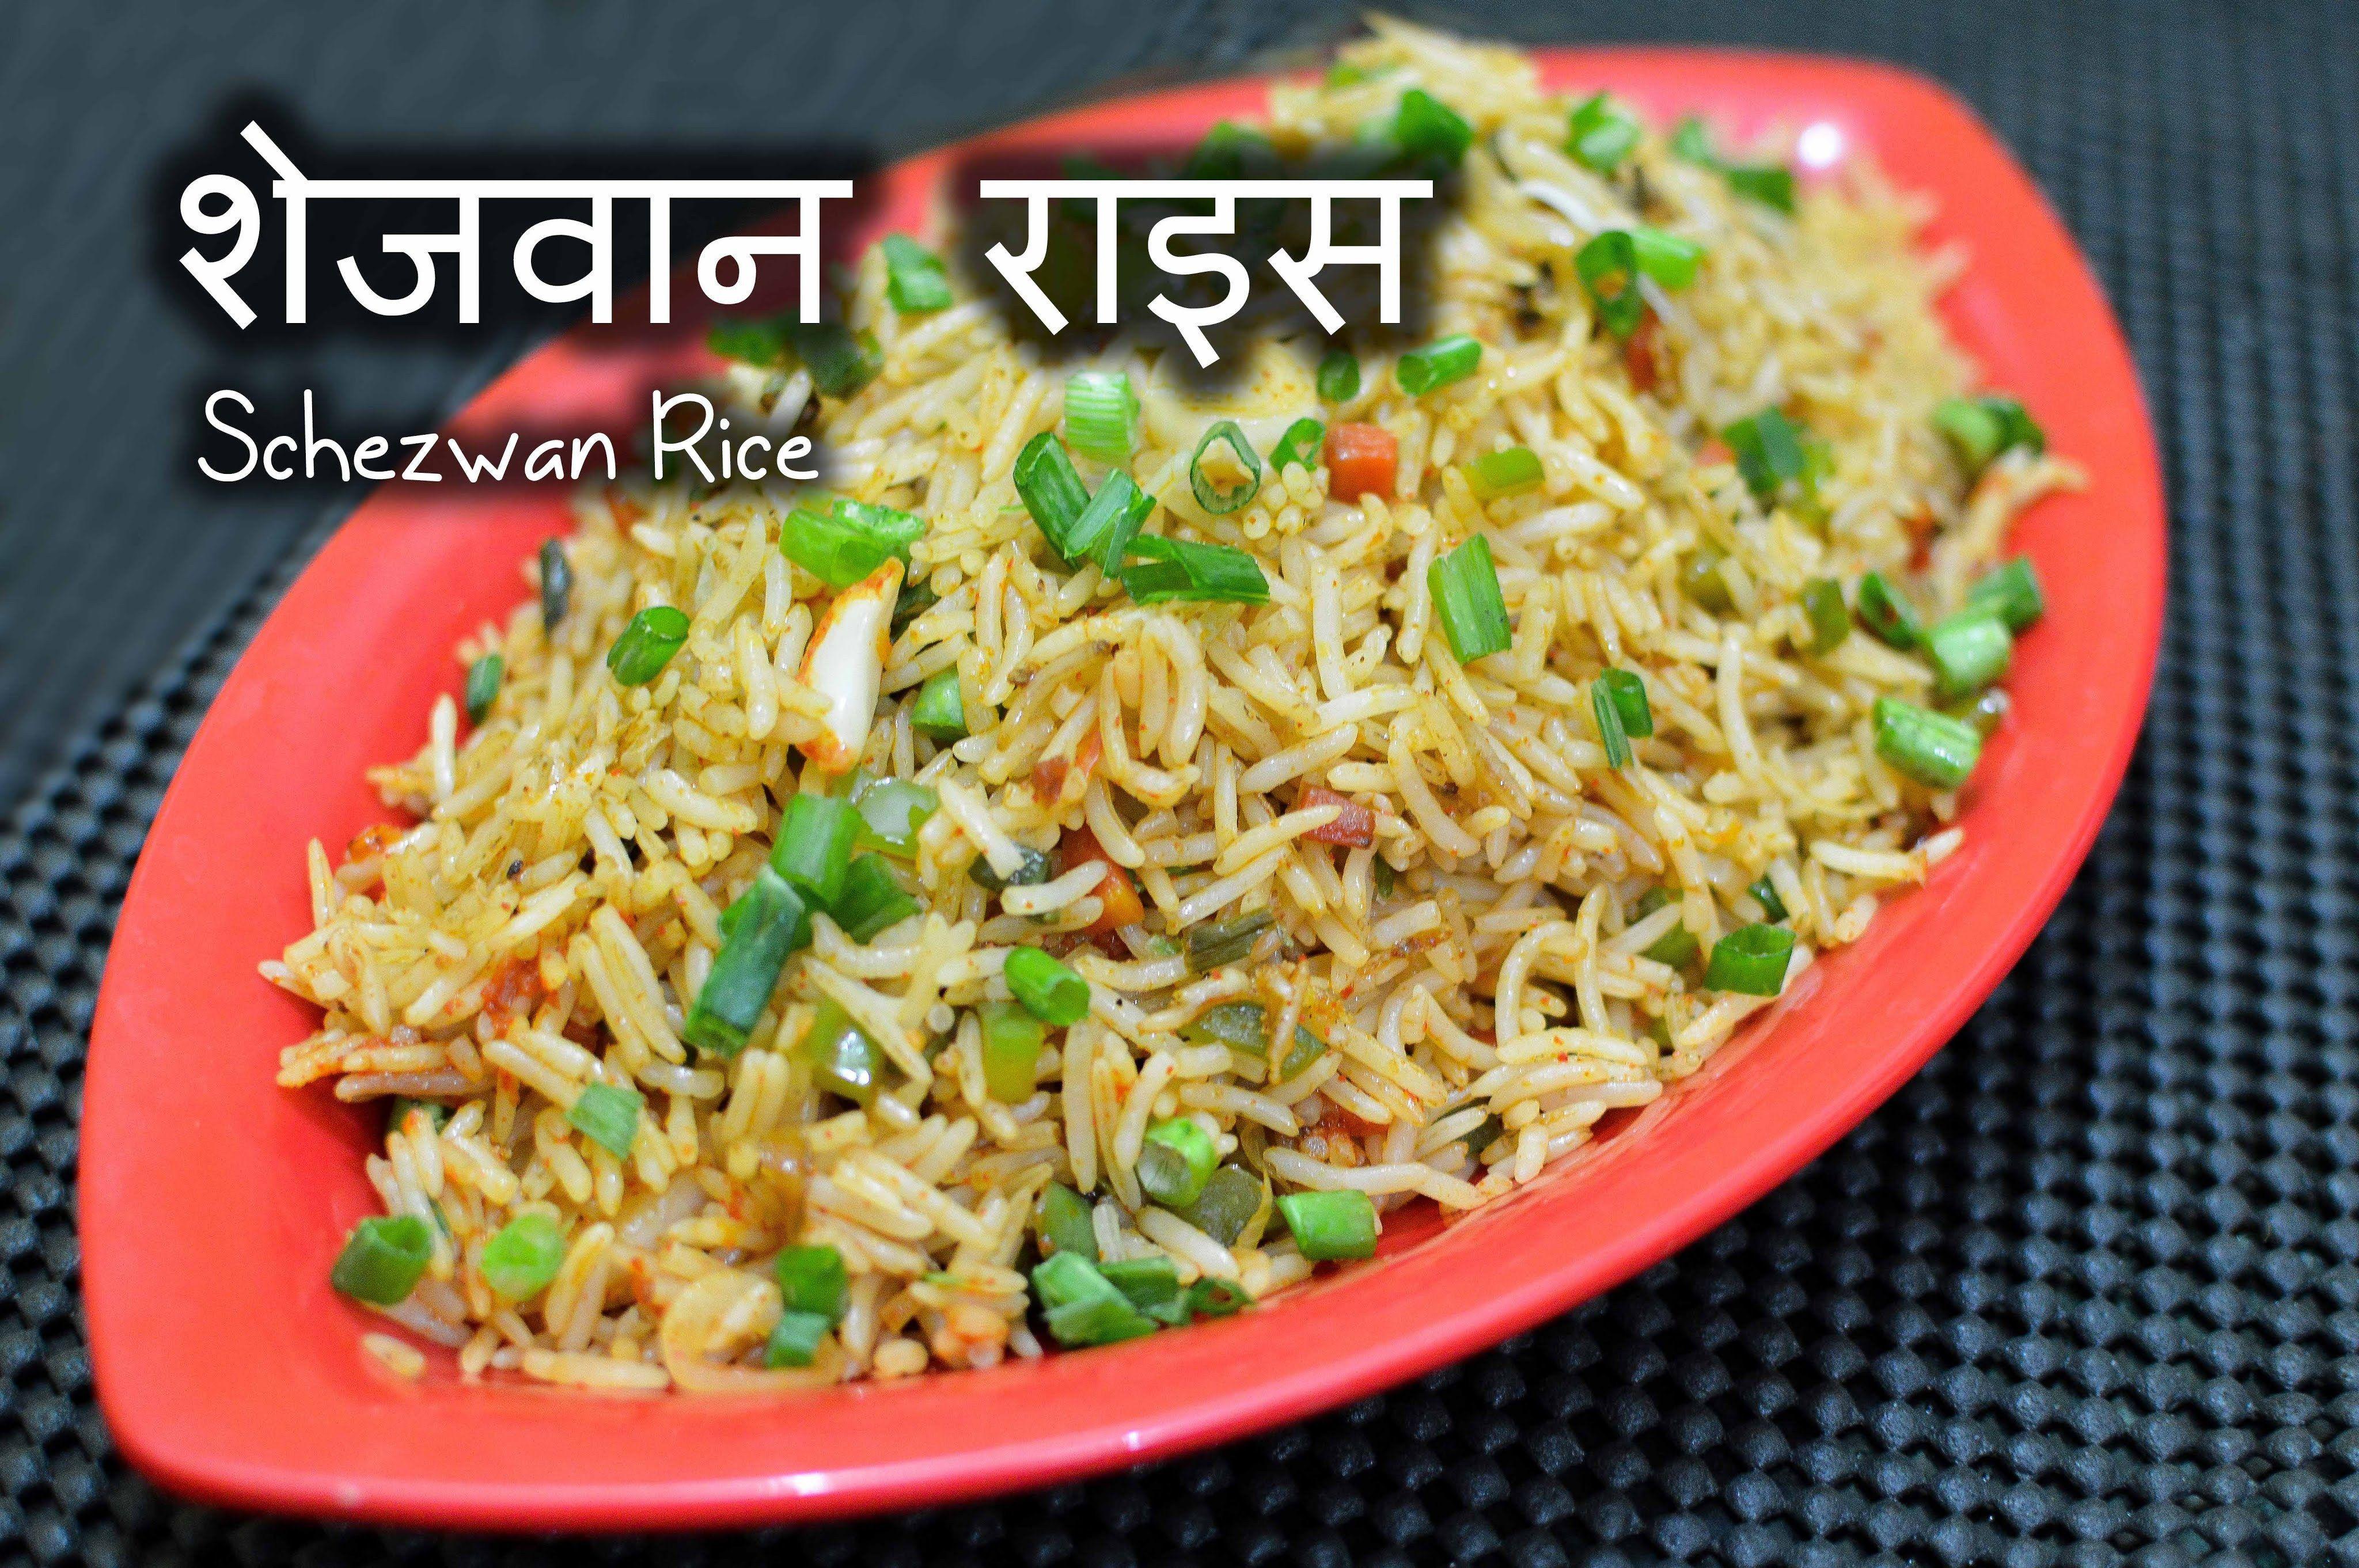 Schezwan fried rice chinese schezwan rice simple recipe hindi video food schezwan fried rice chinese schezwan rice simple recipe hindi forumfinder Choice Image